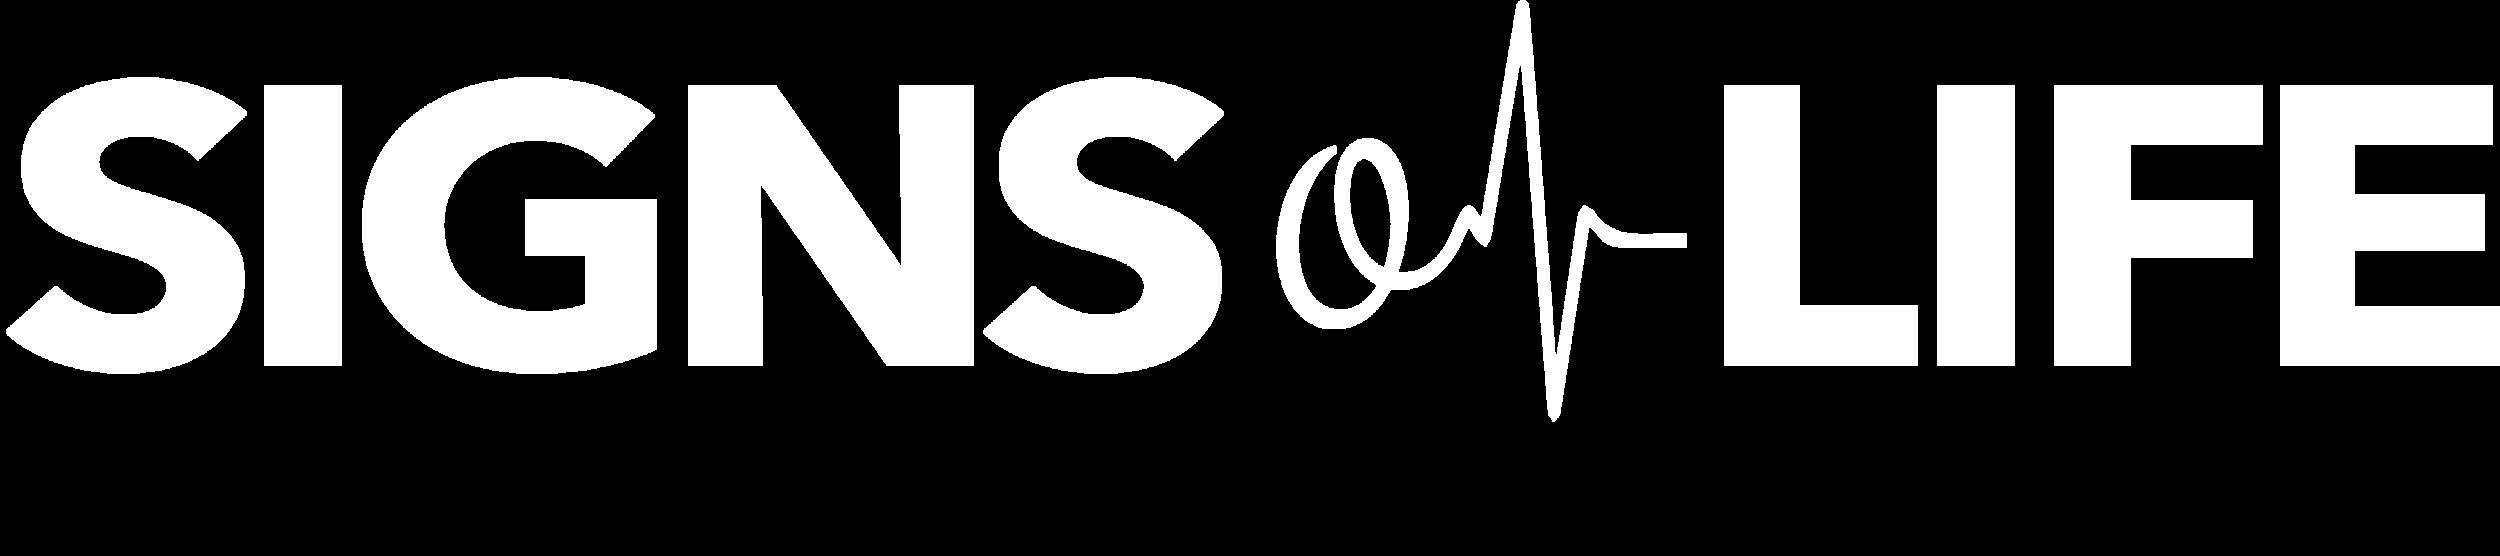 signsoflife